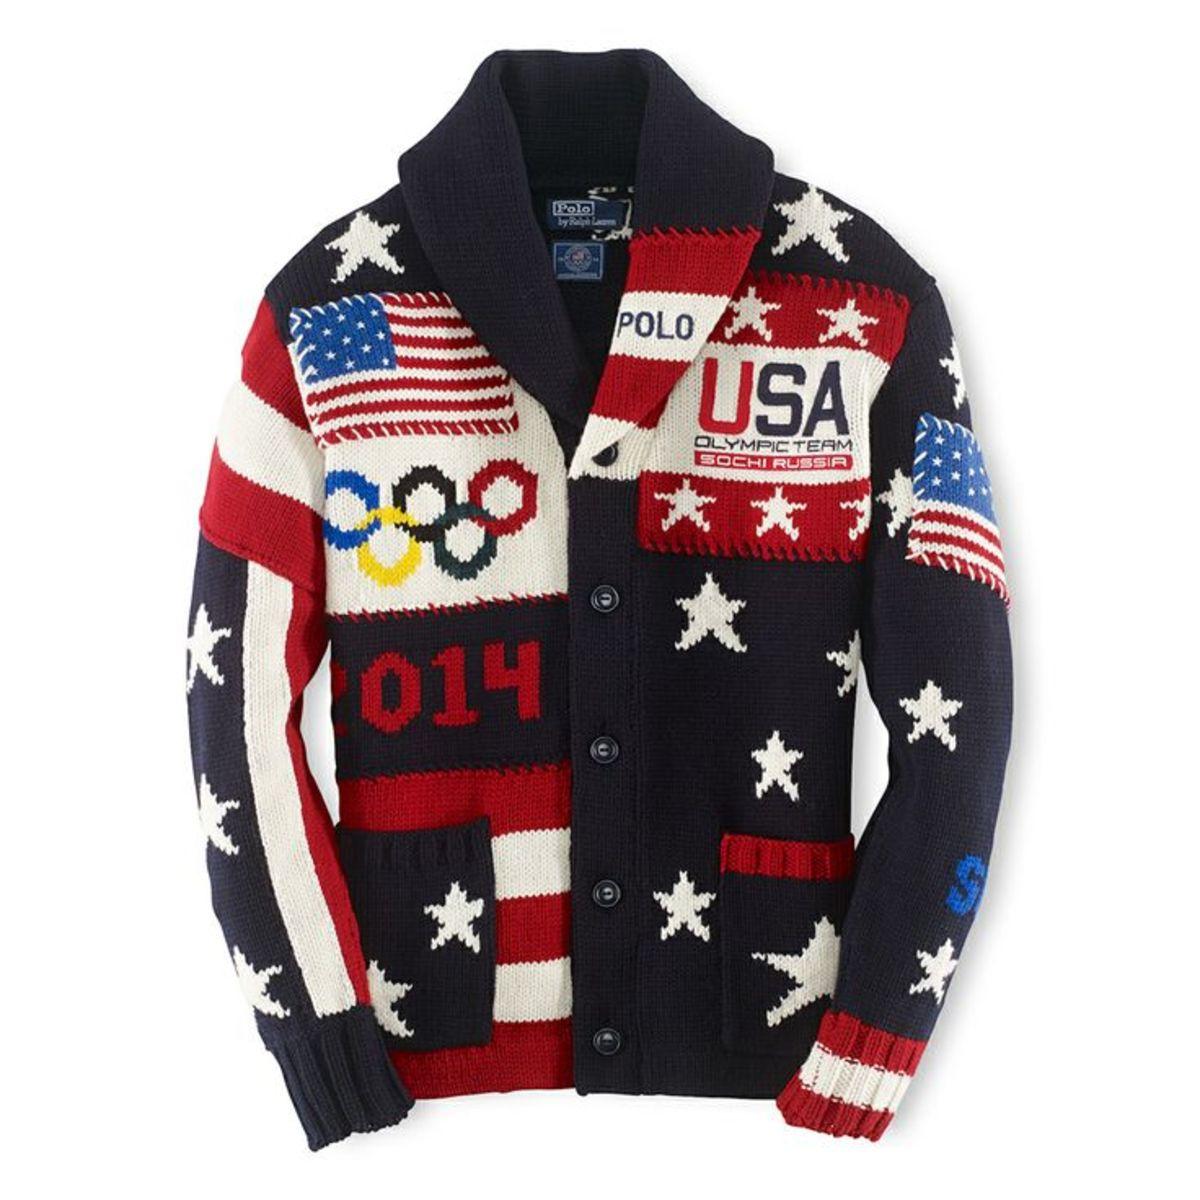 Ralph Lauren Olympic sweater